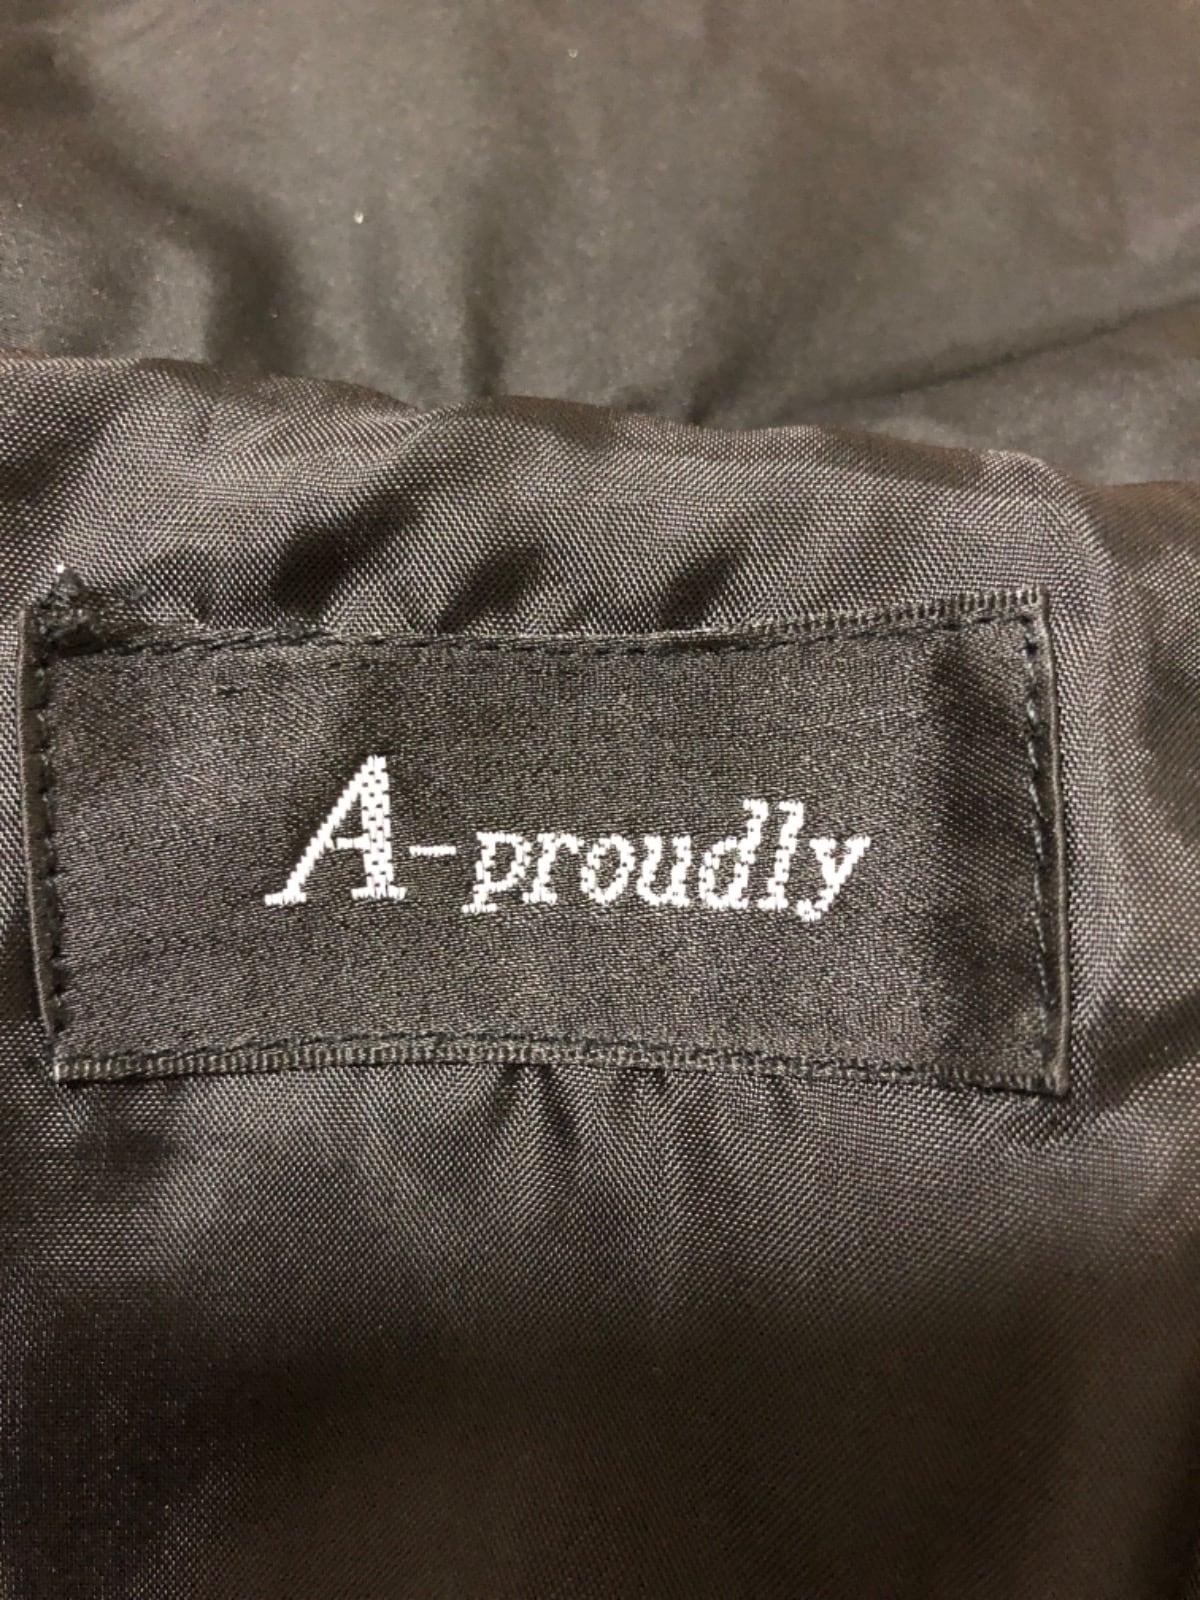 A-proudly(エープラウドリー)のダウンコート